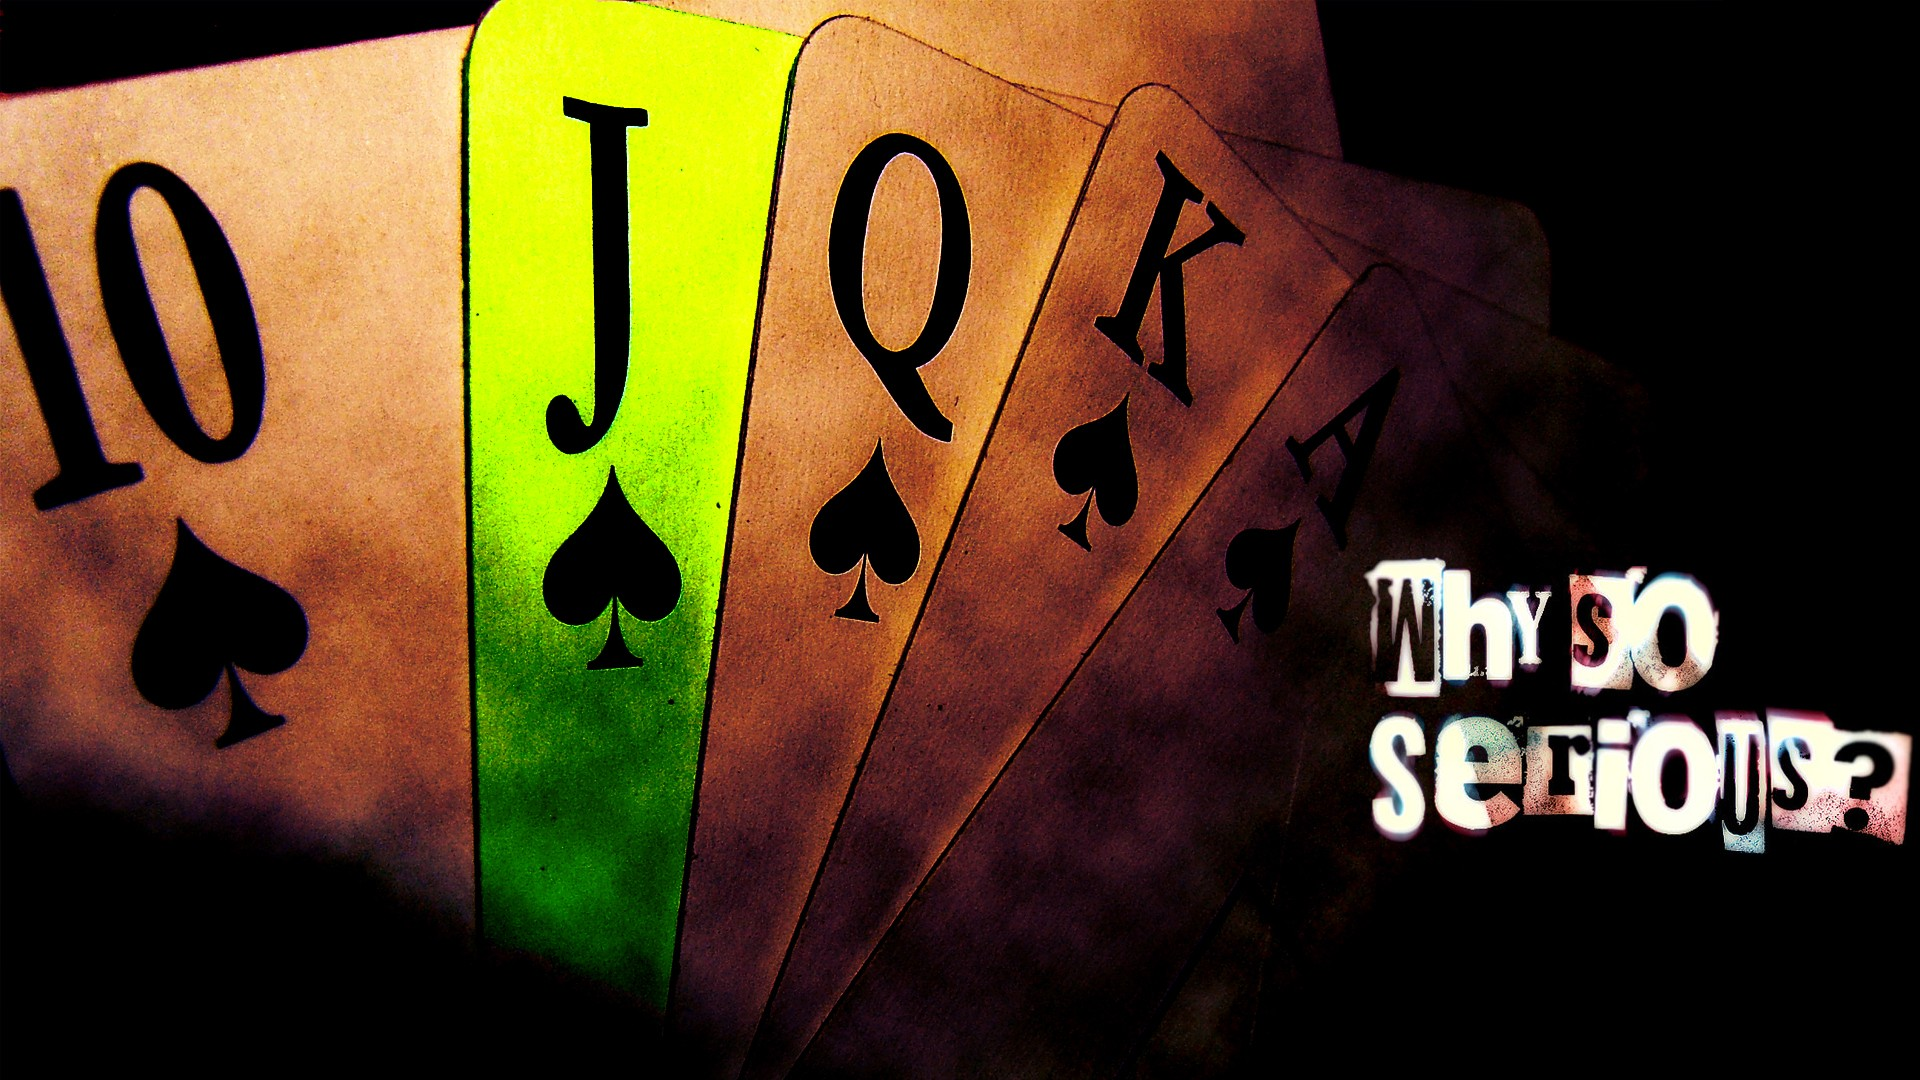 cards poker digital art luck playing cards joker playing card 1920x1080